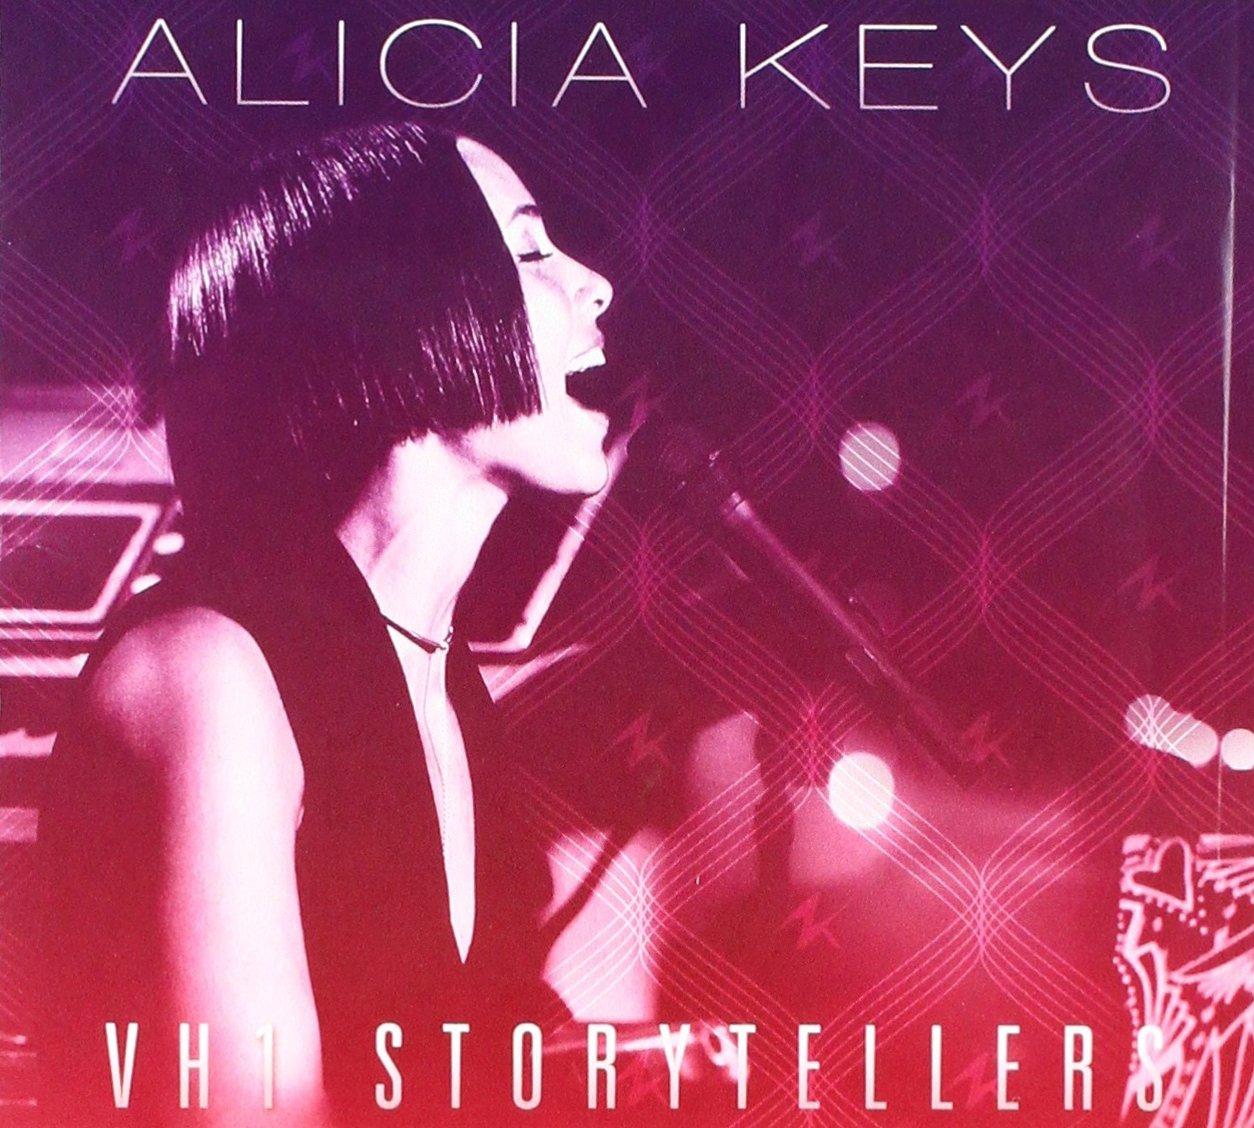 Alicia keys not even the king lyrics mp3 download lyrics tip.